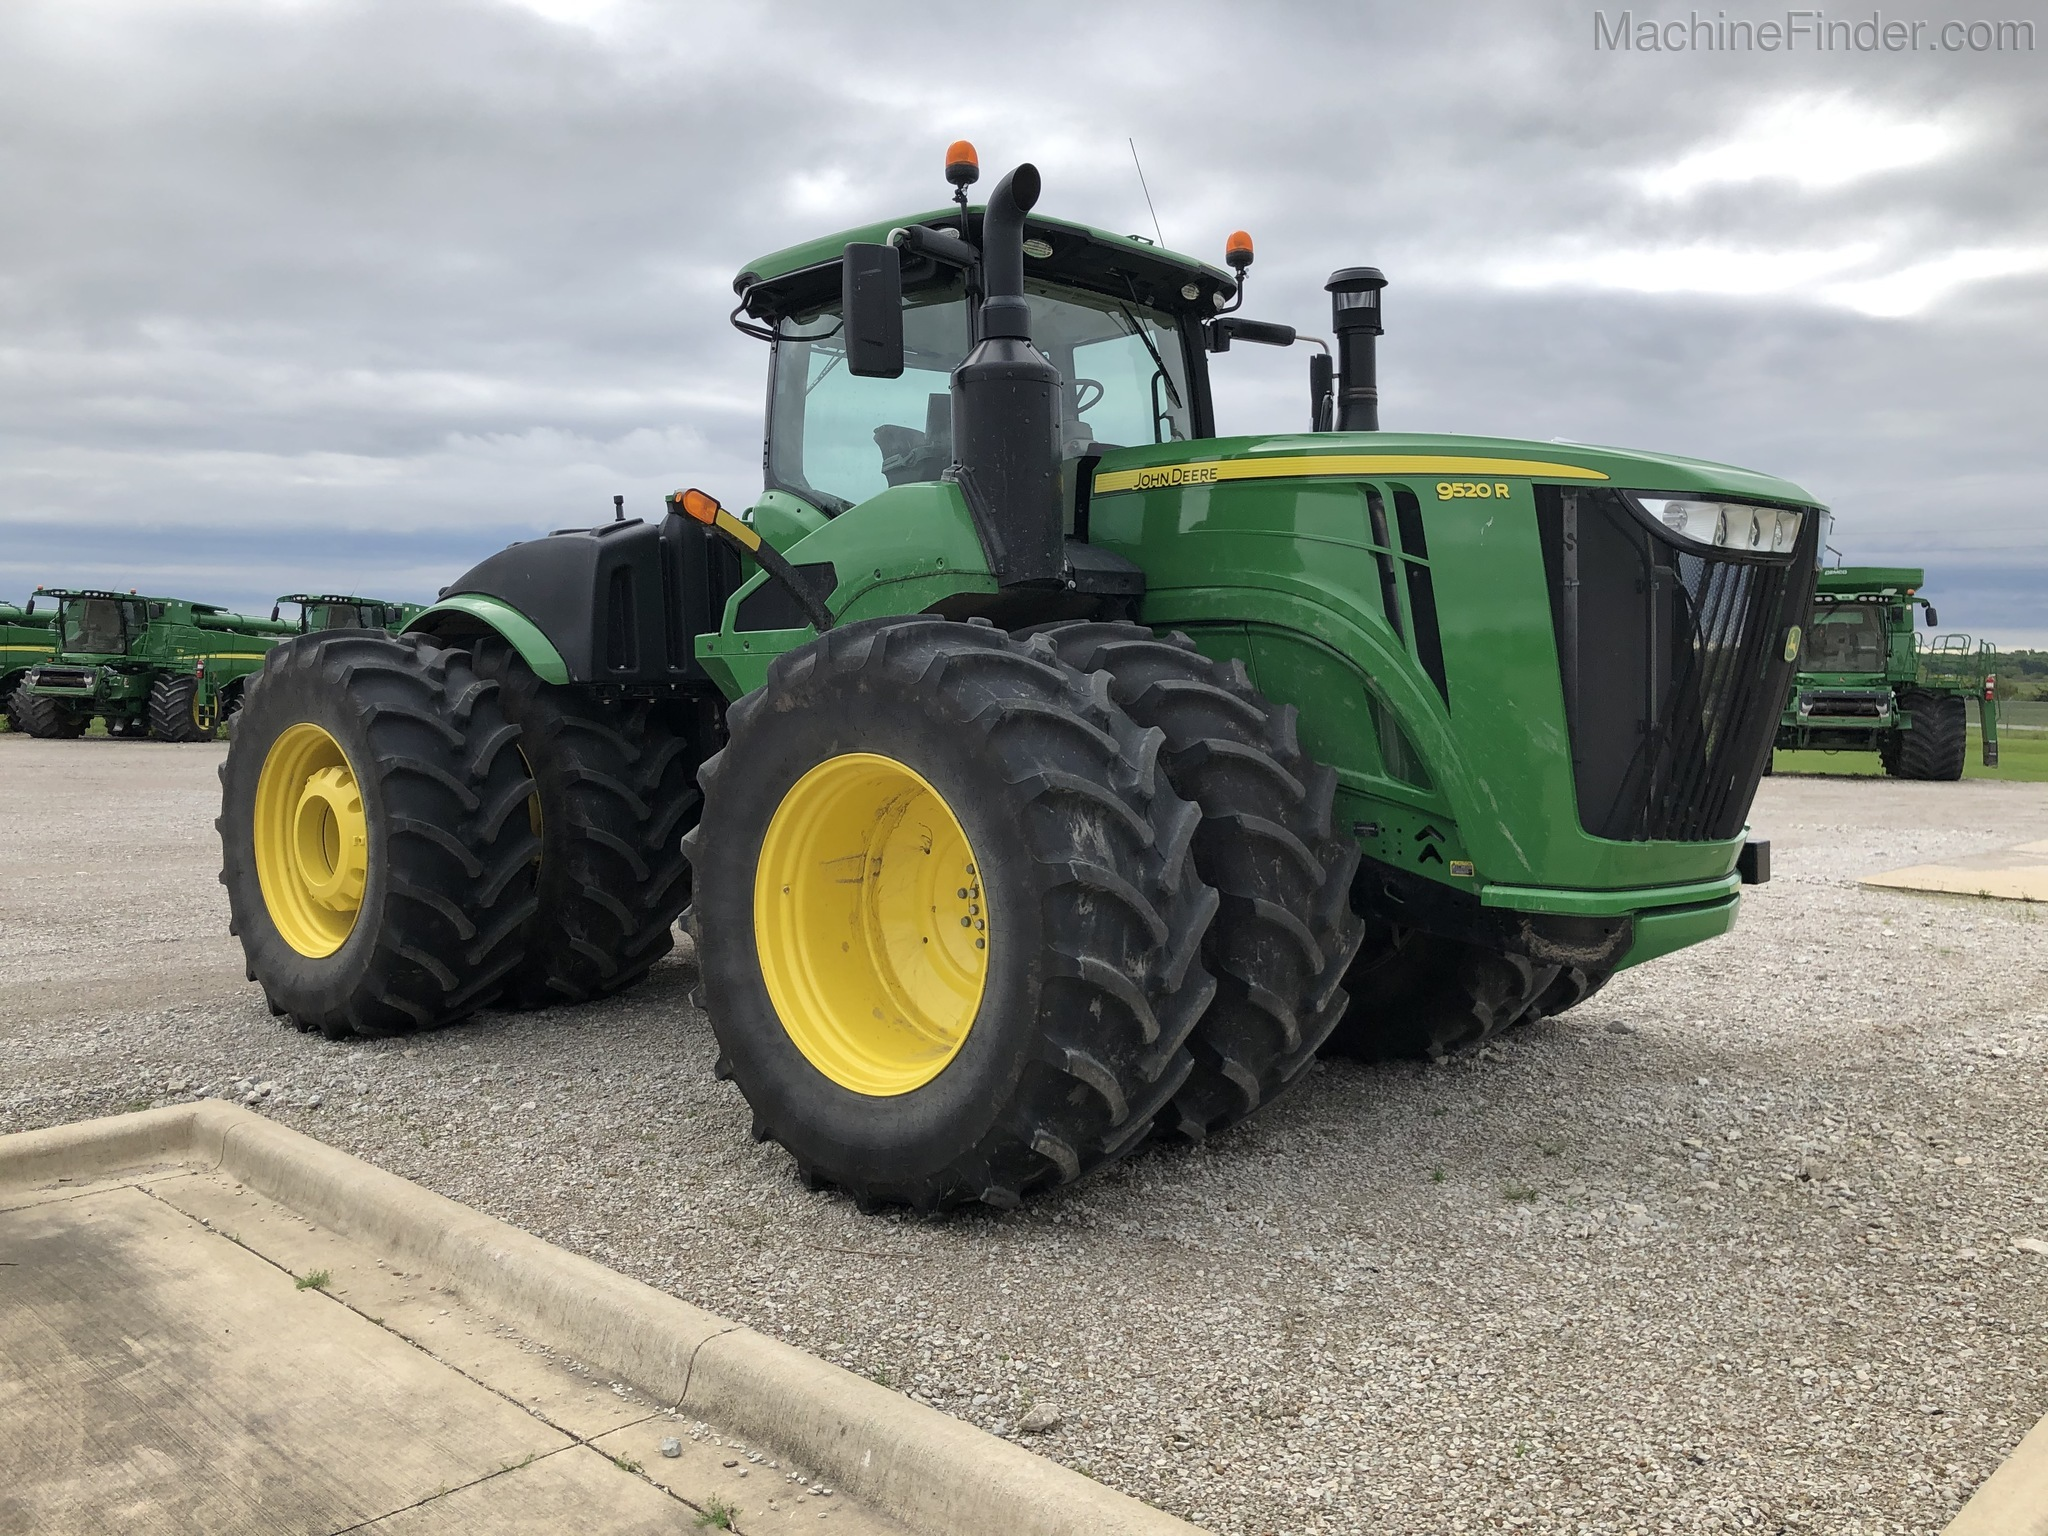 2019 John Deere 9520R